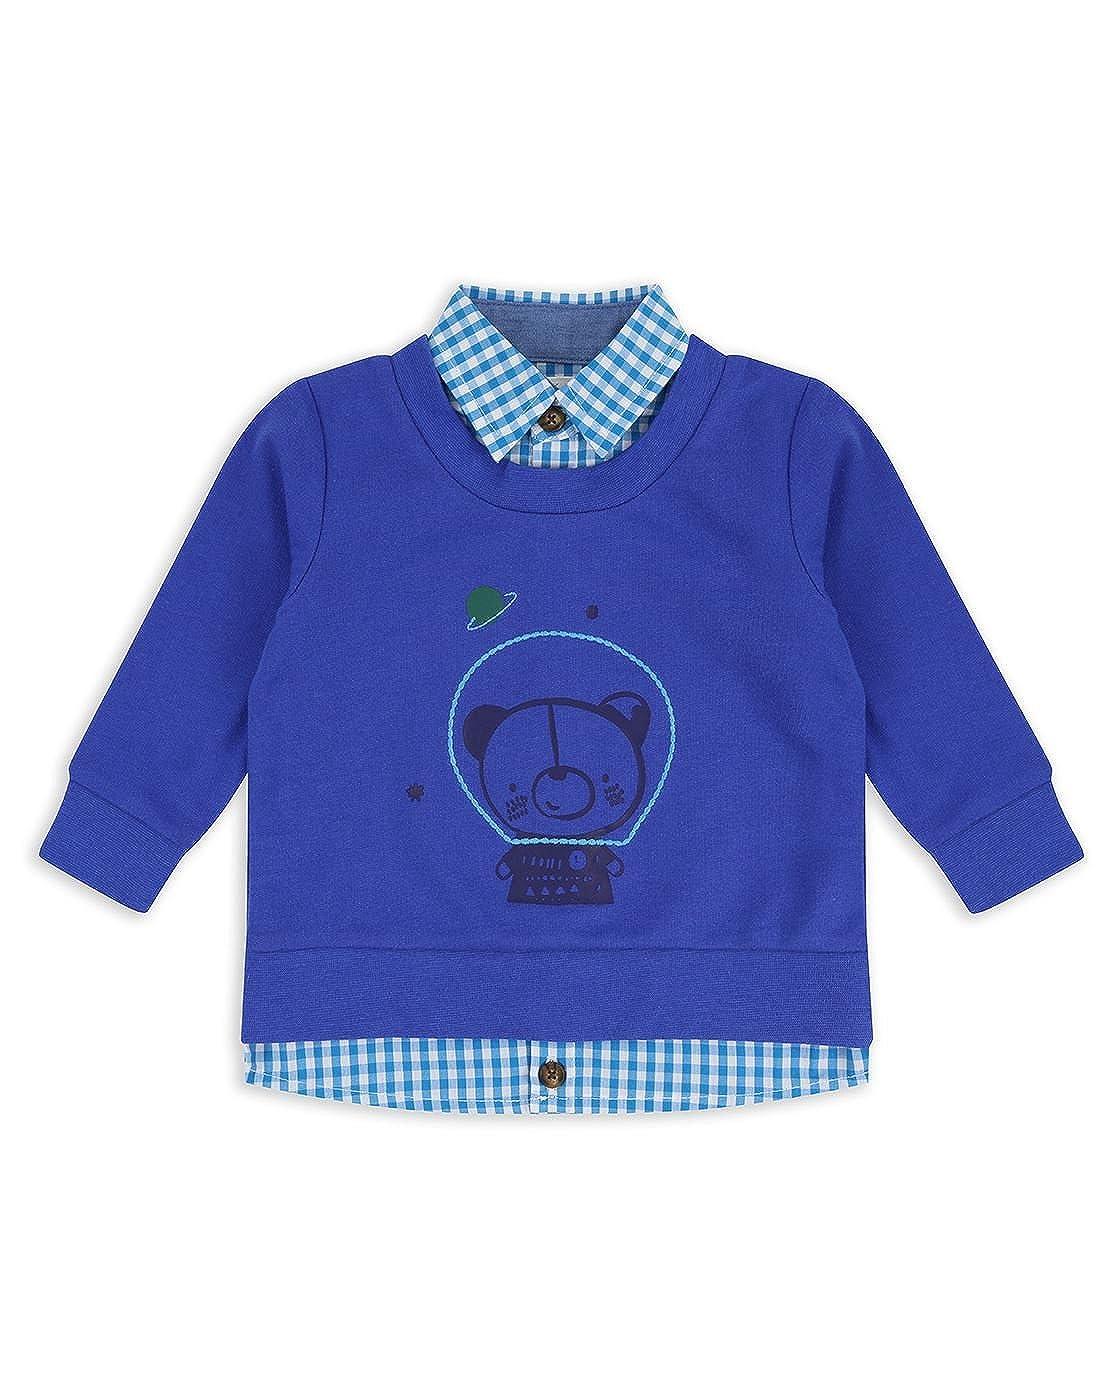 The Essential One Baby Kids Boys Mock Shirt Sweatshirt - Blue - EOT475